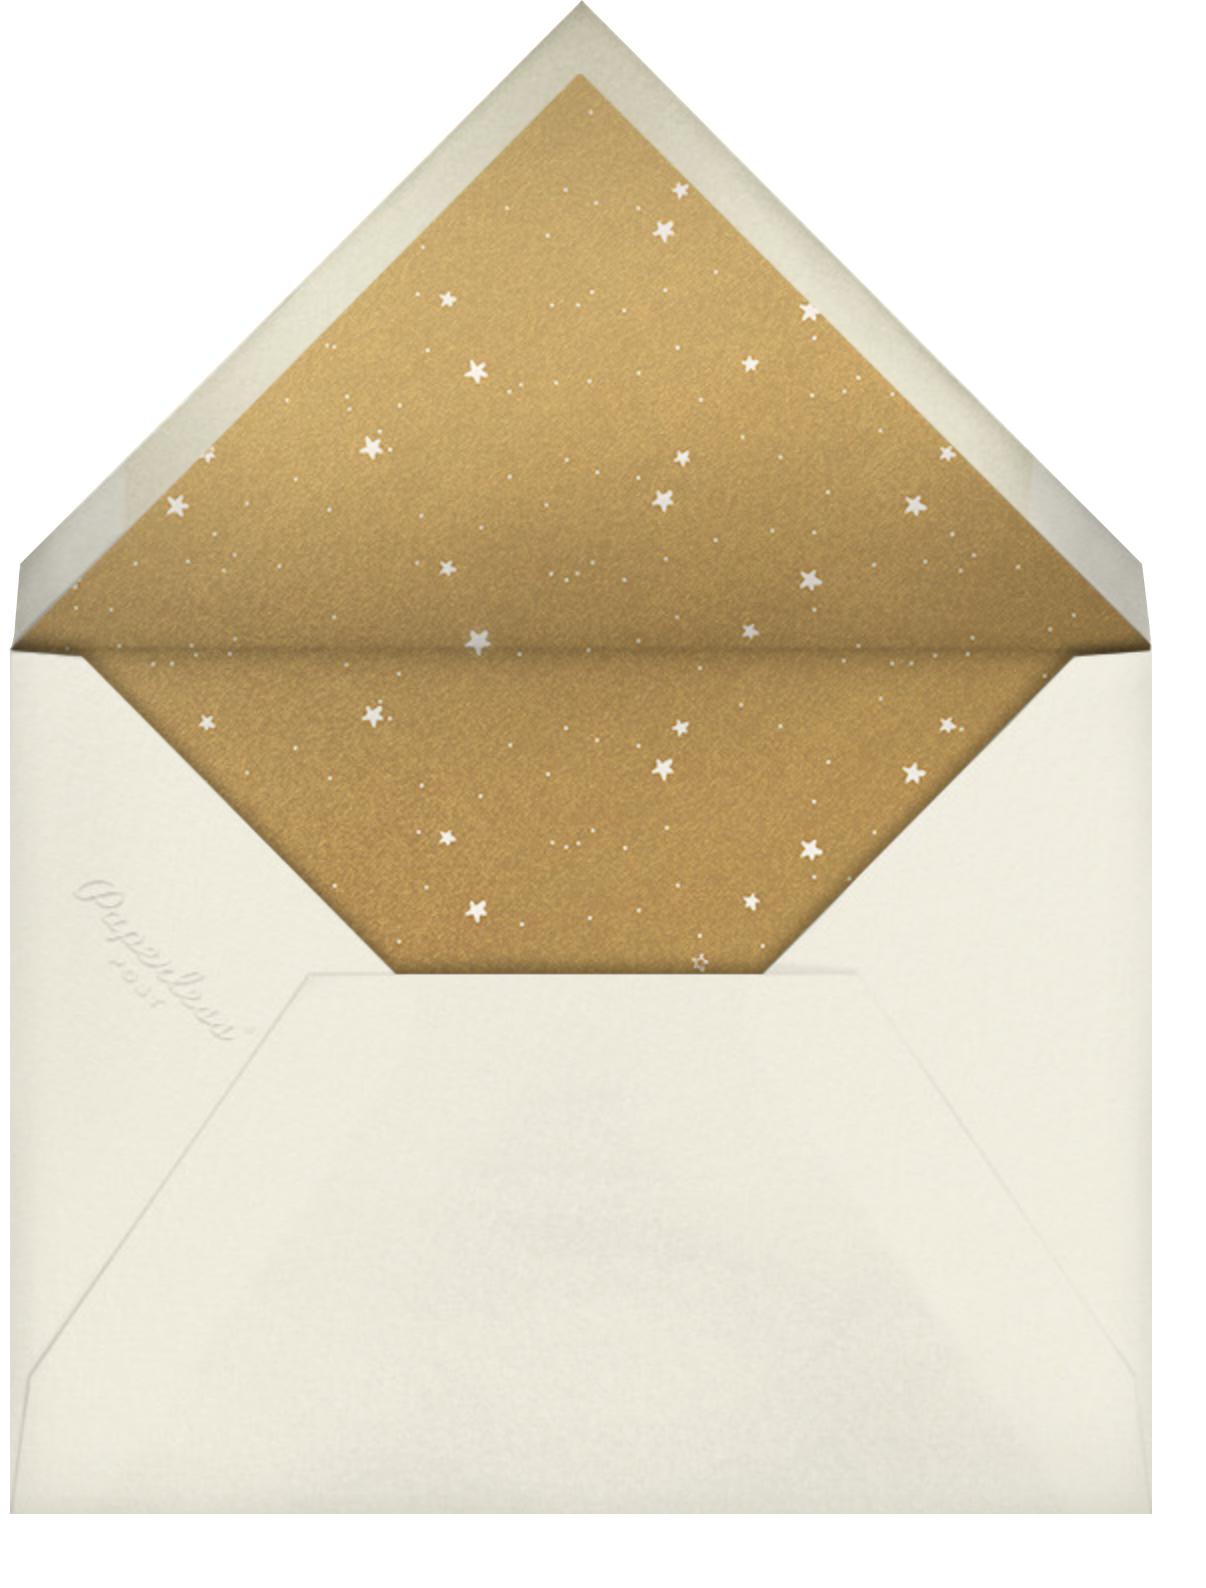 Joyful Jumps - Vashti Harrison - Envelope